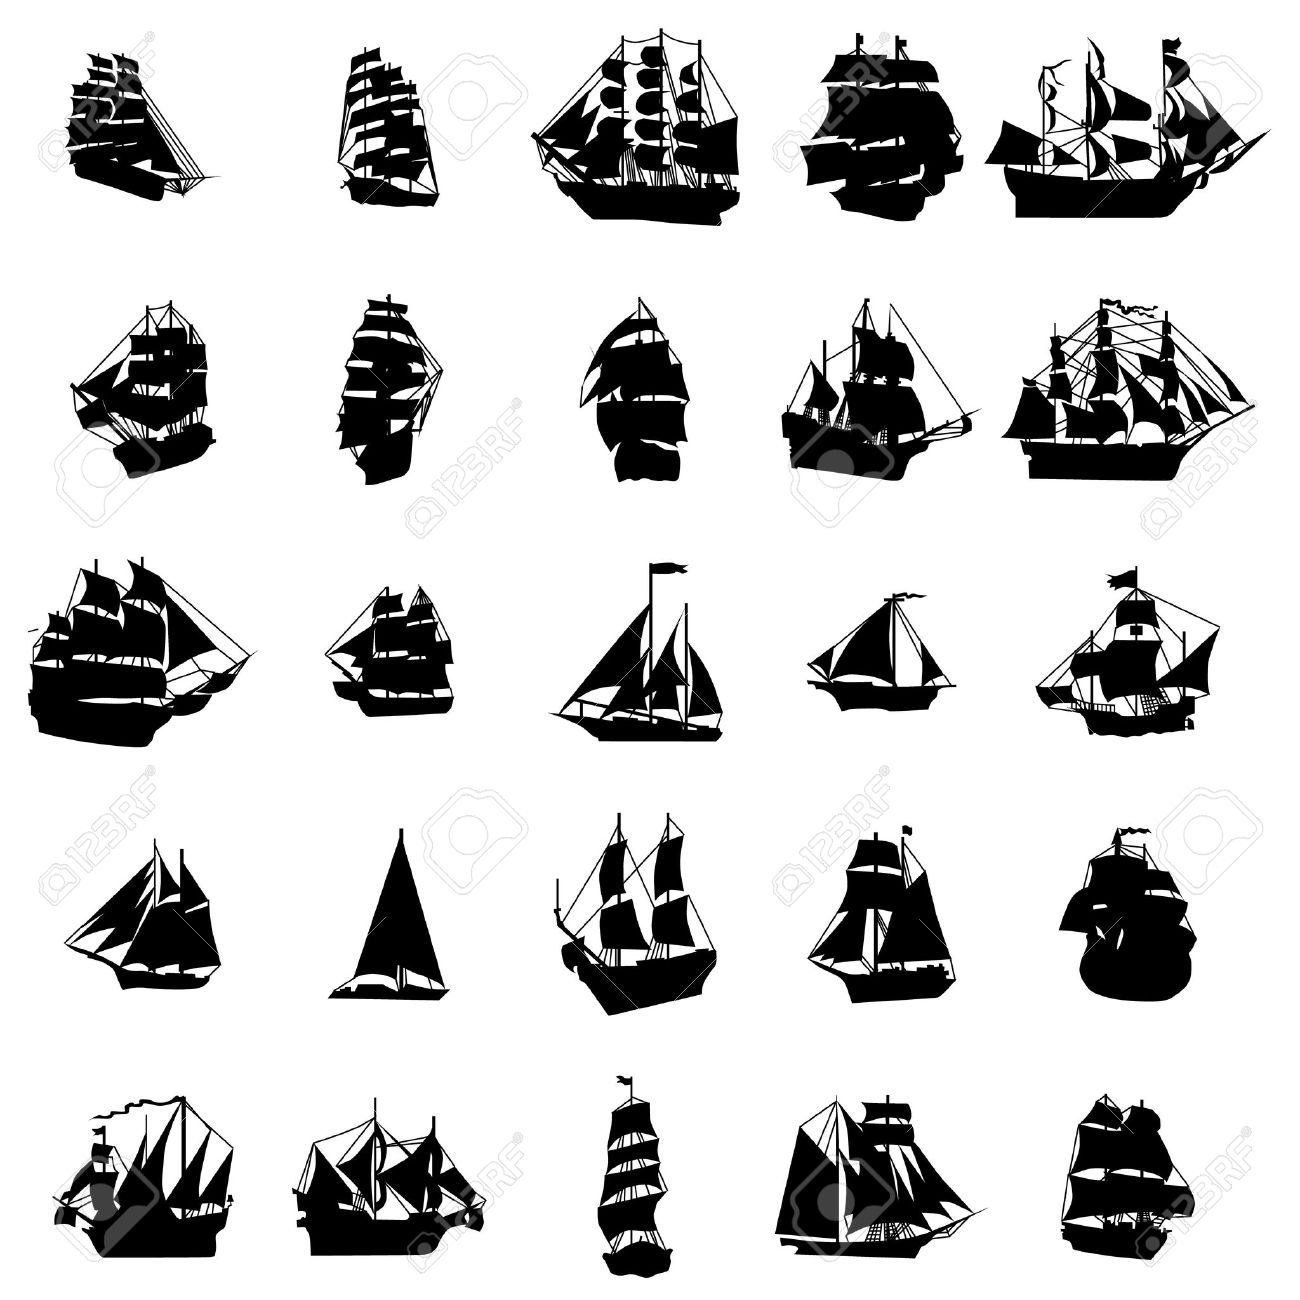 pirate ship silhouette stock photos royalty free pirate ship